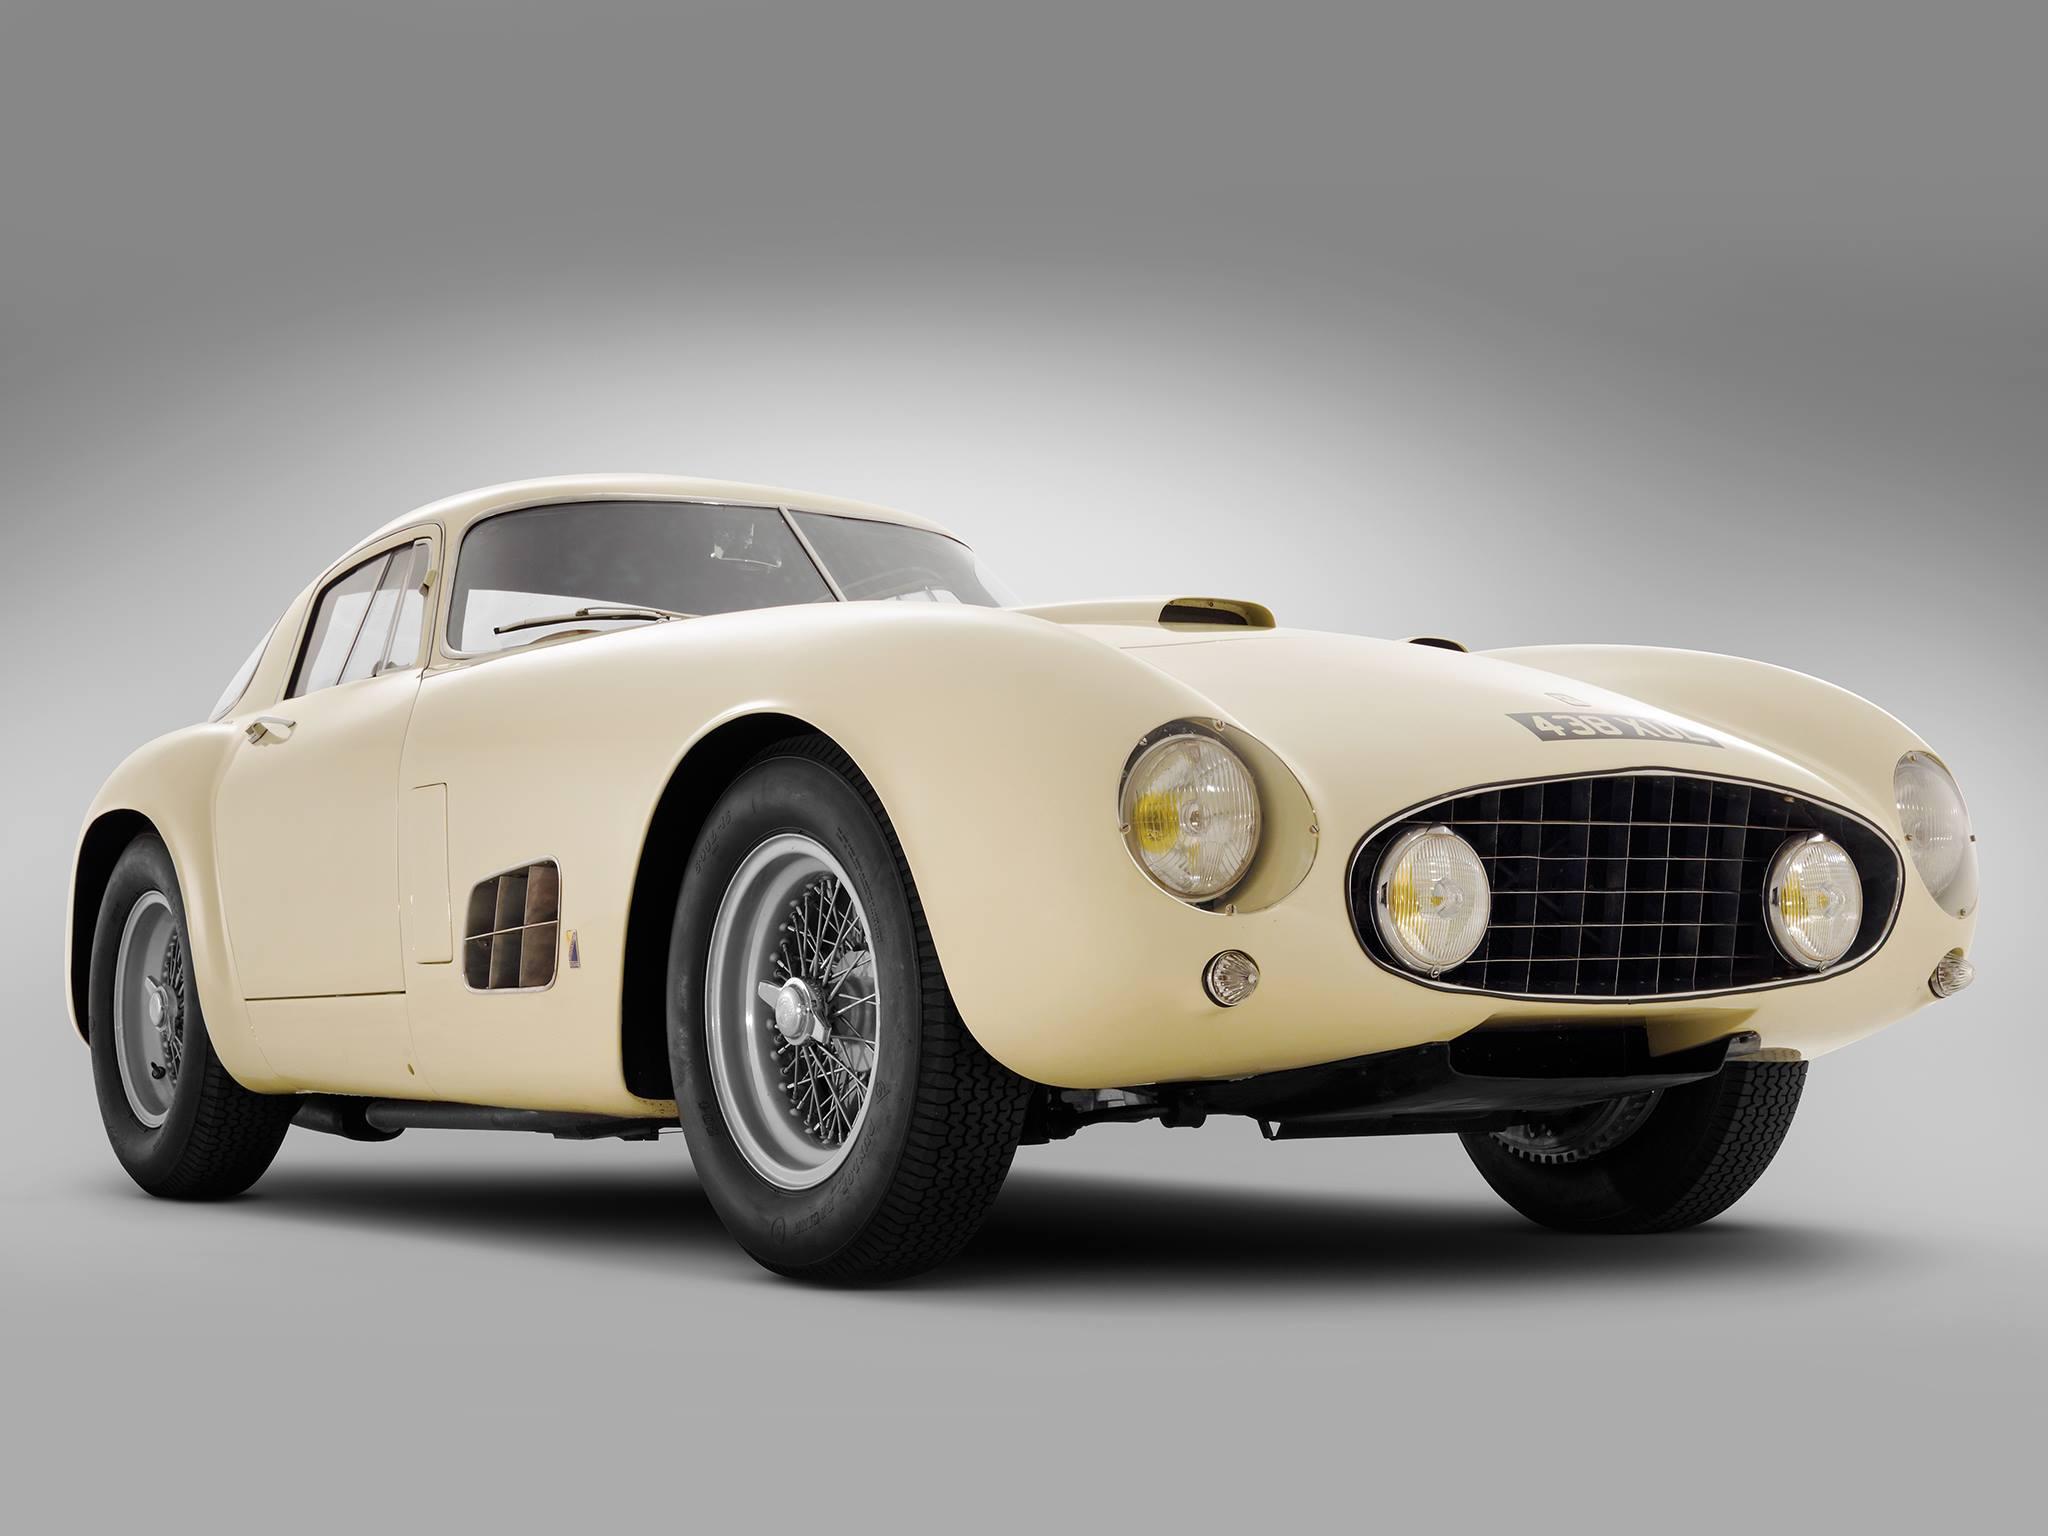 1955-Ferrari-410-Speciale-Berlinetta-1